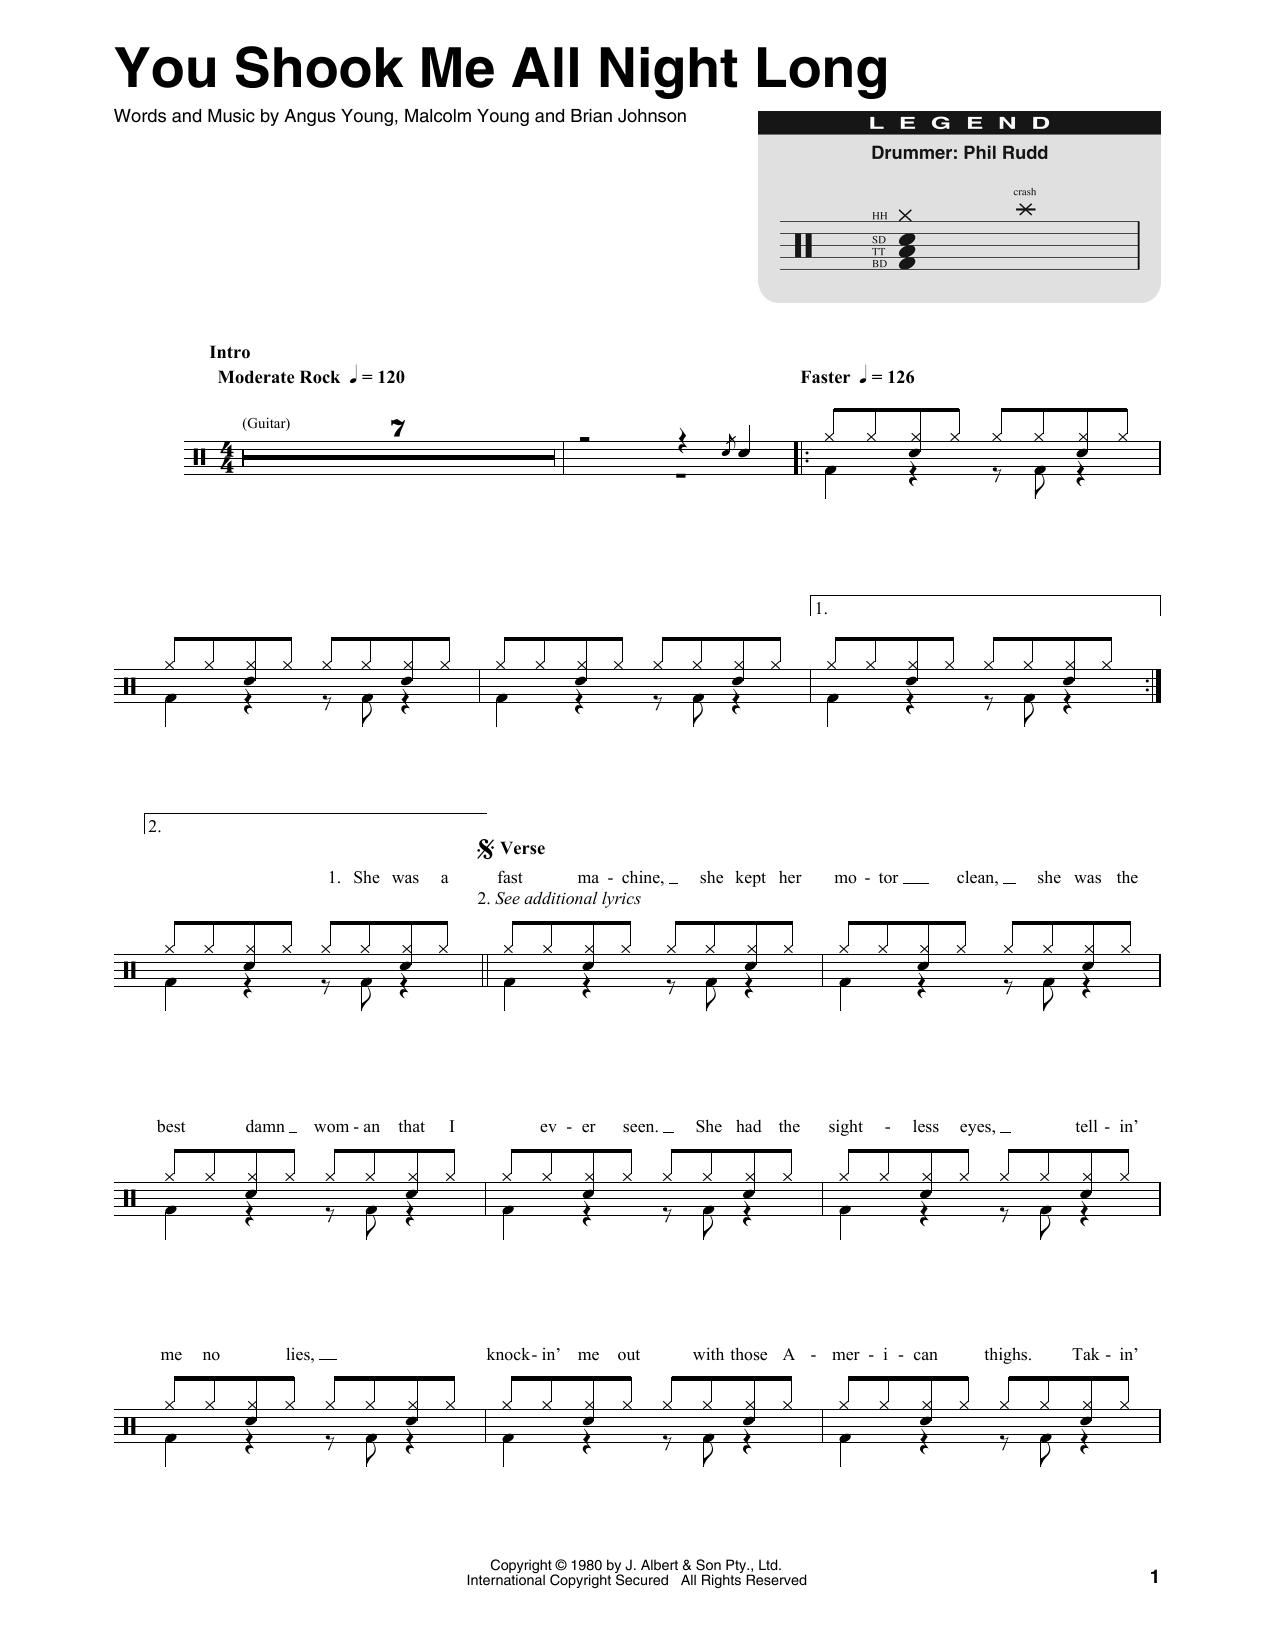 AC/DC 'You Shook Me All Night Long' Sheet Music Notes, Chords | Download  Printable Drums Transcription - SKU: 414587